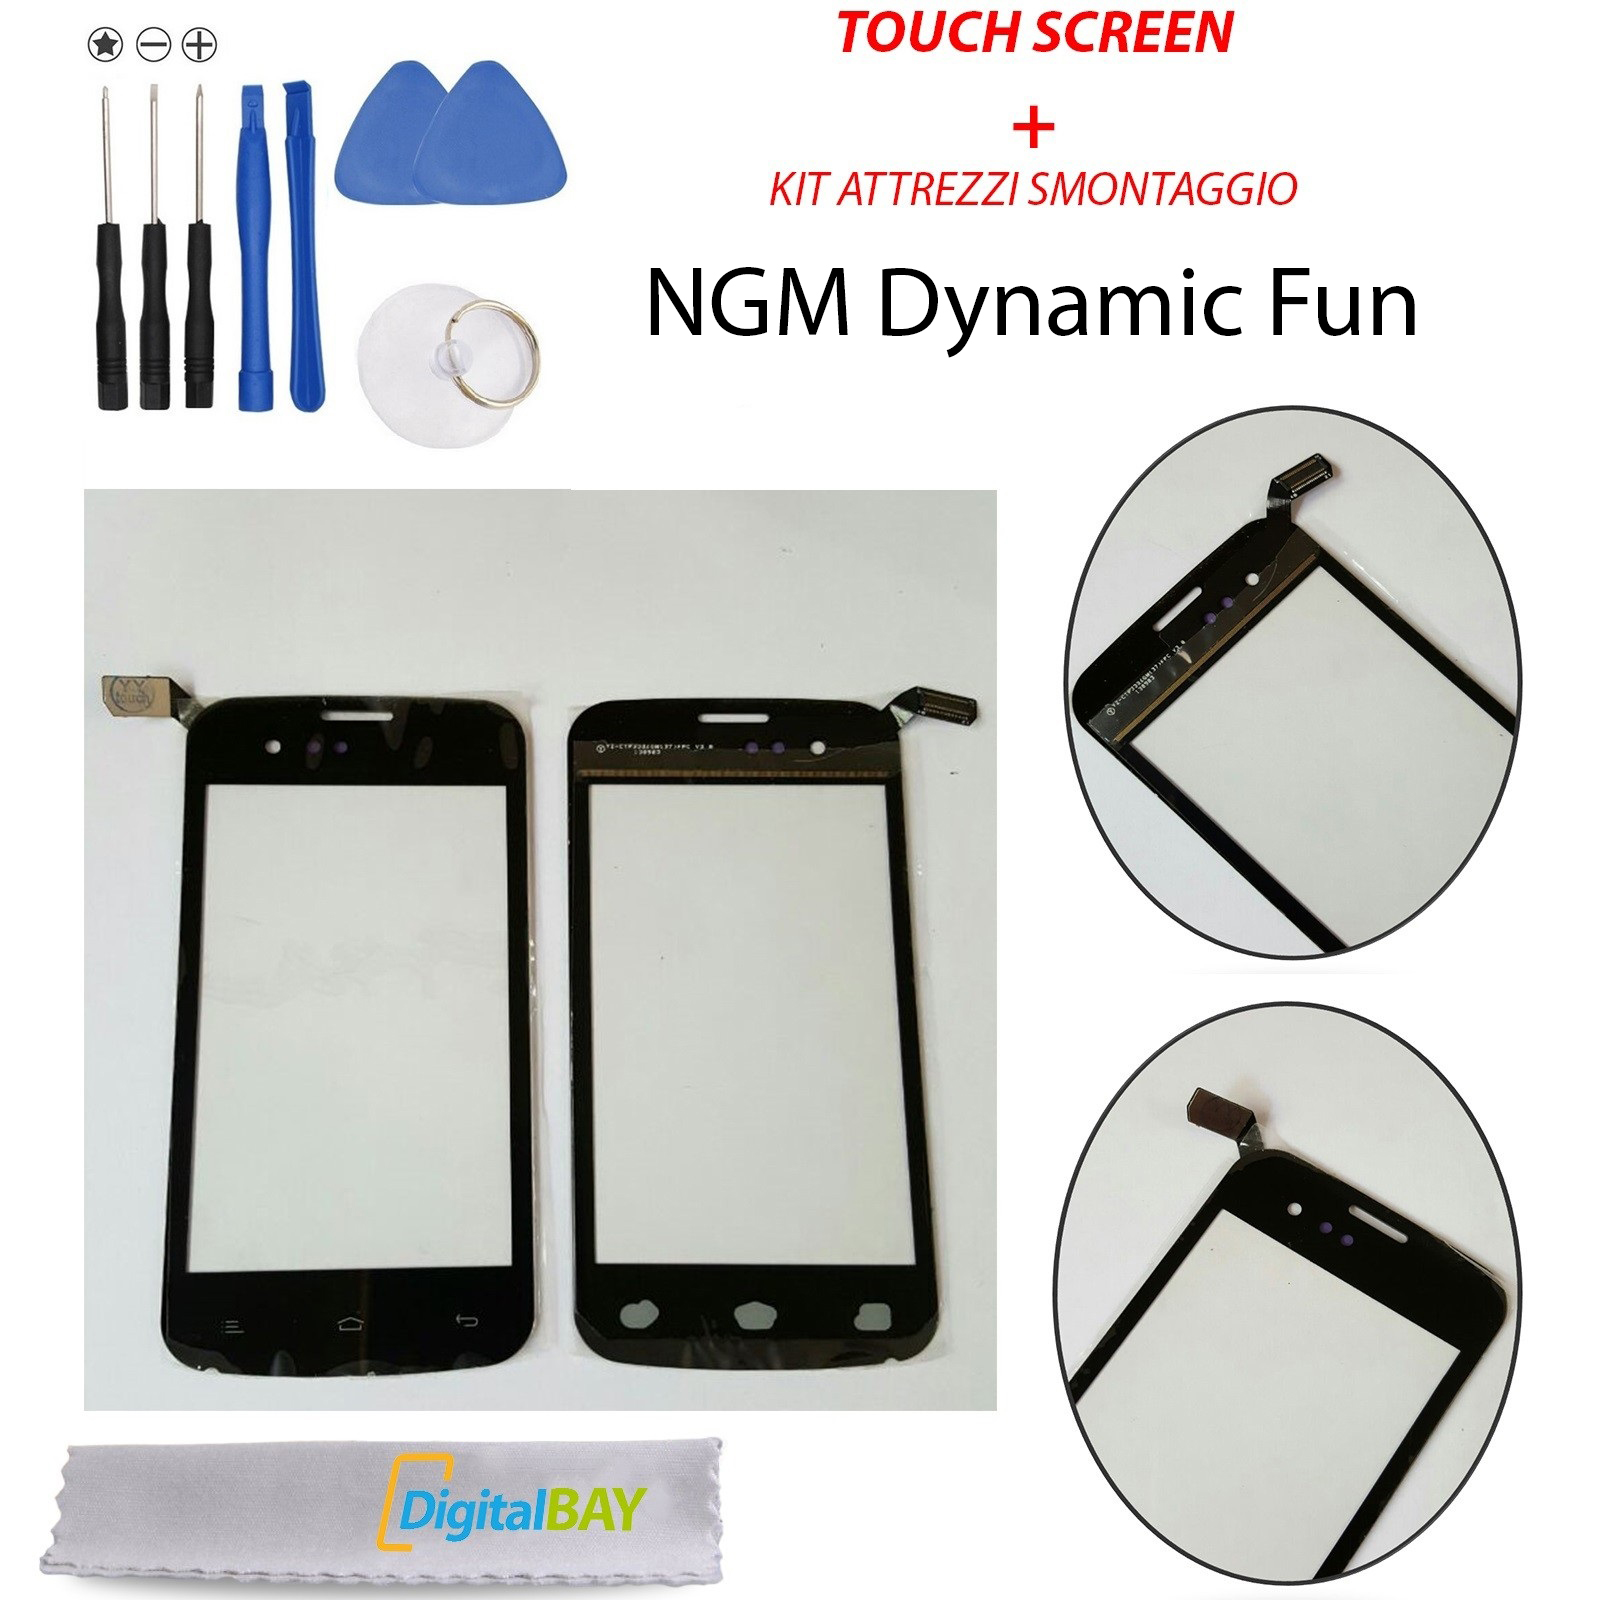 Touch Screen Kit : Touch screen vetro glass nero display schermo per ngm